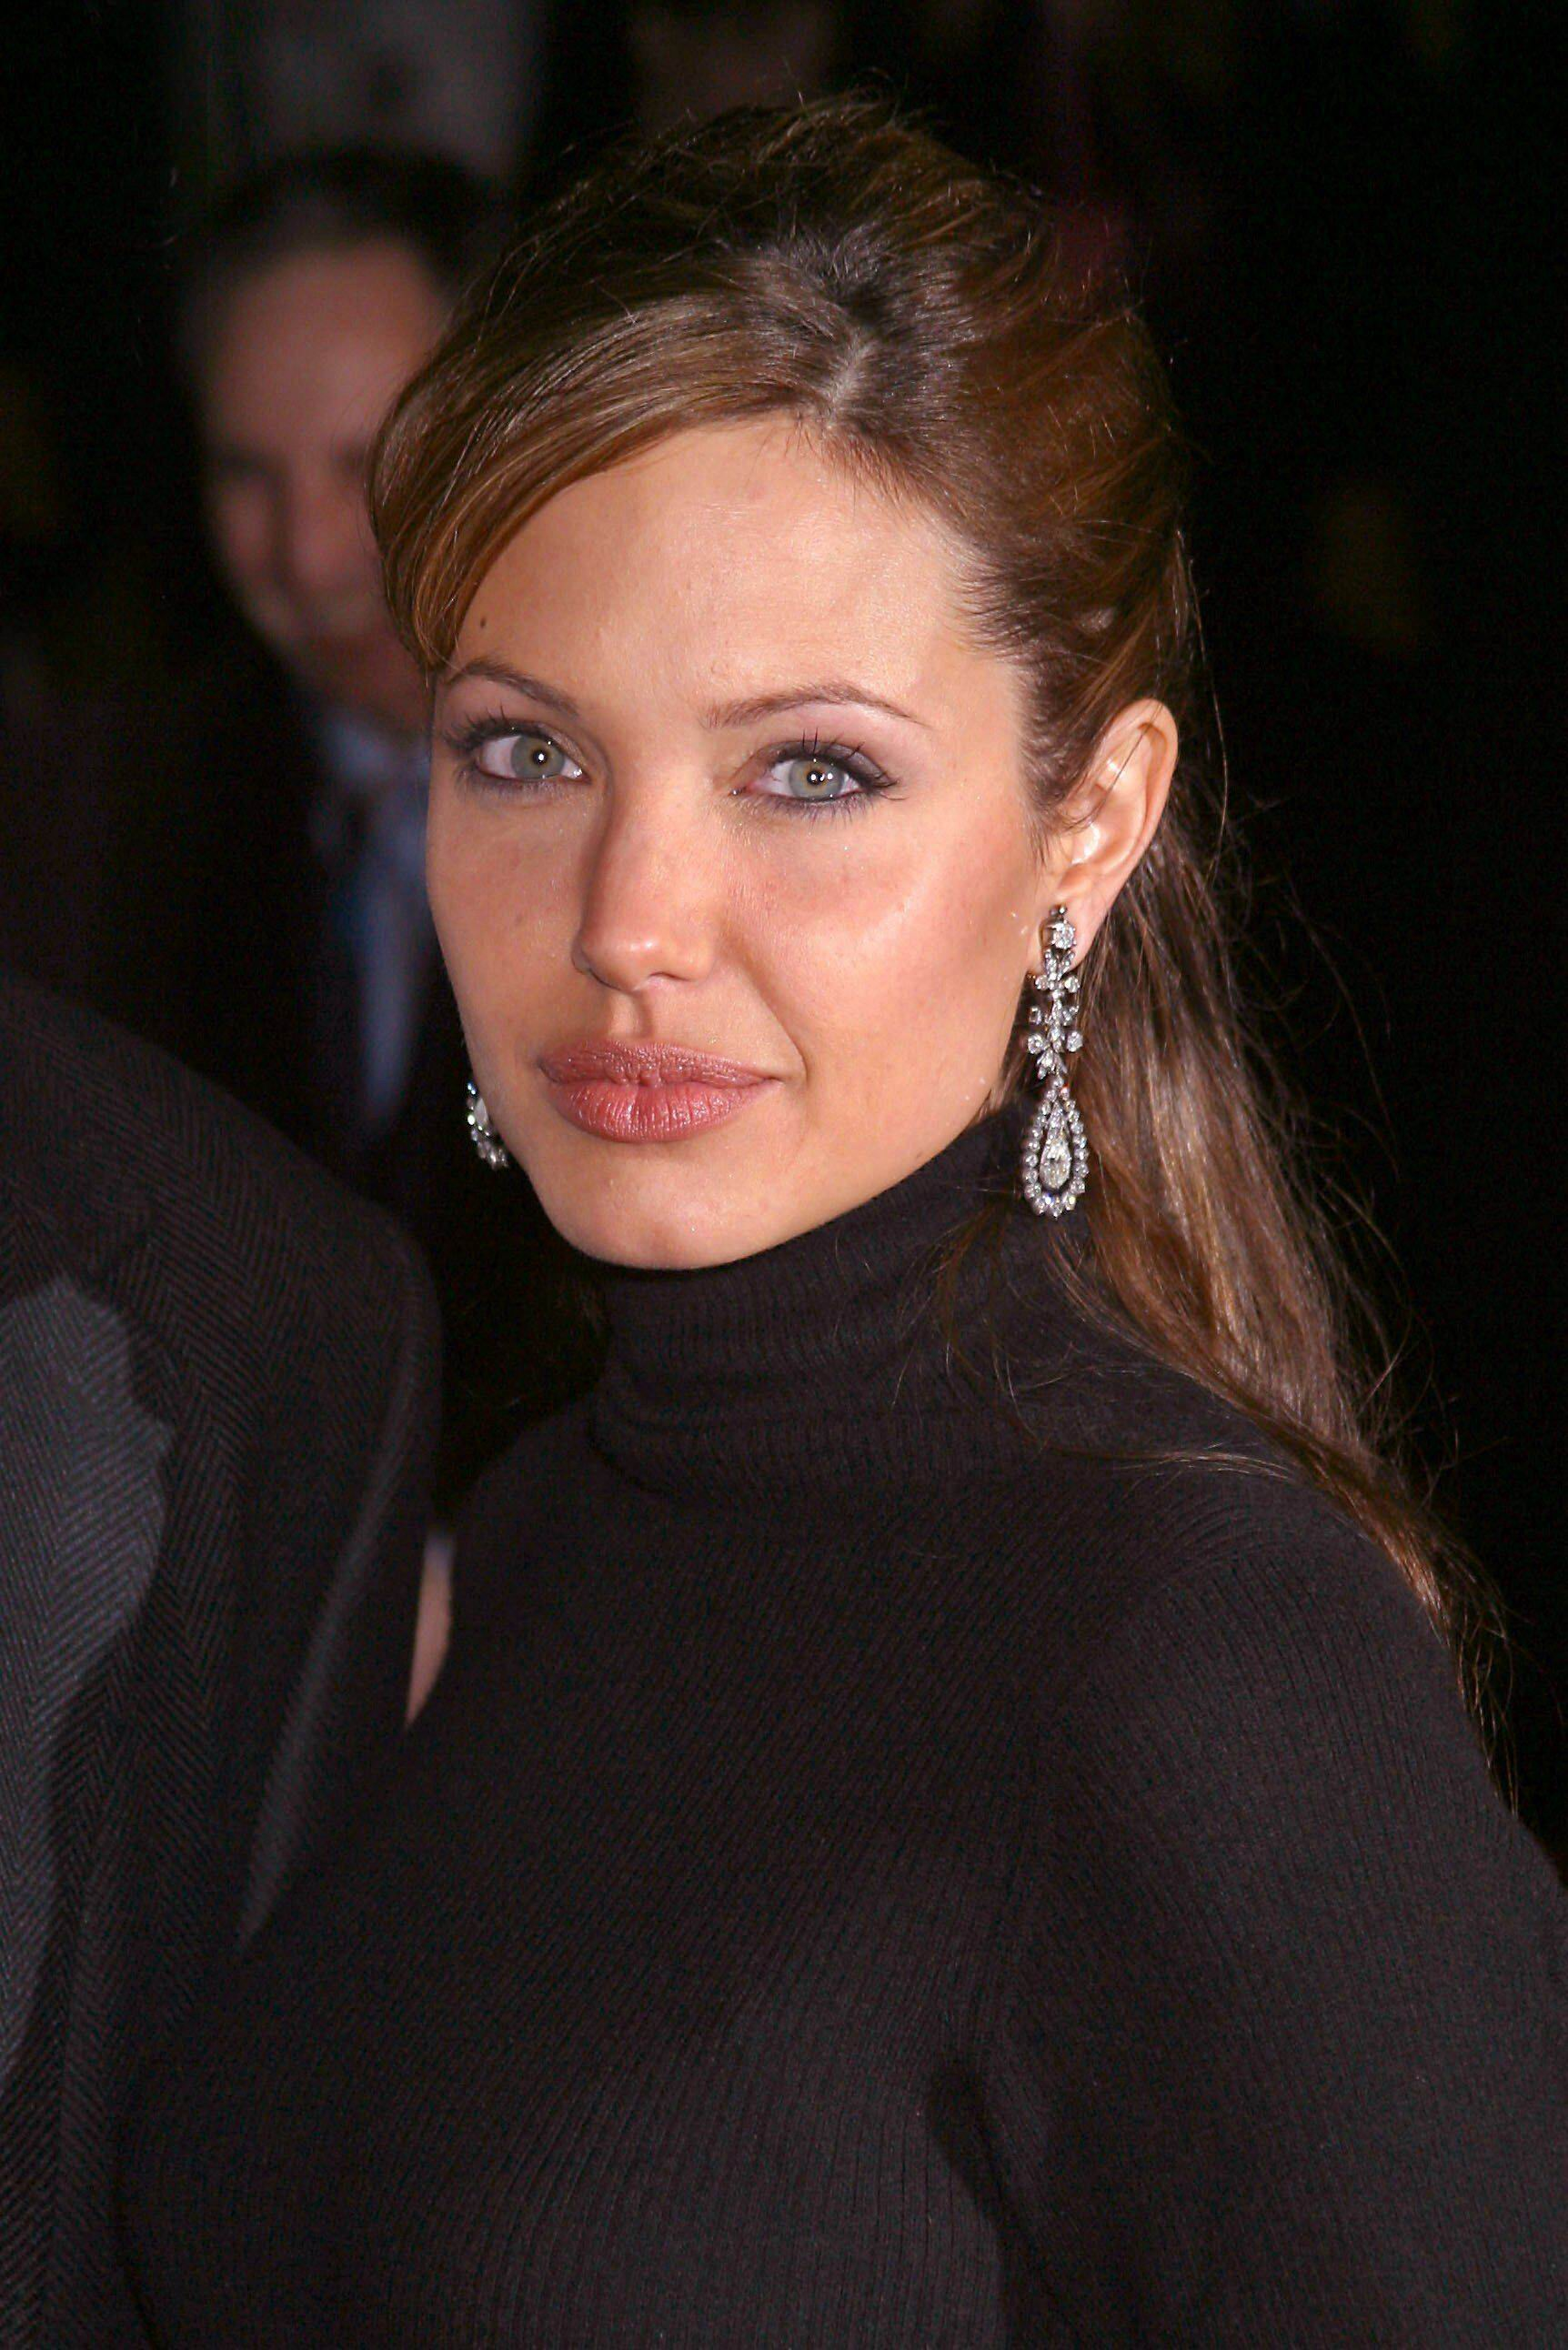 Angelina jolie y beowolf escena desnuda